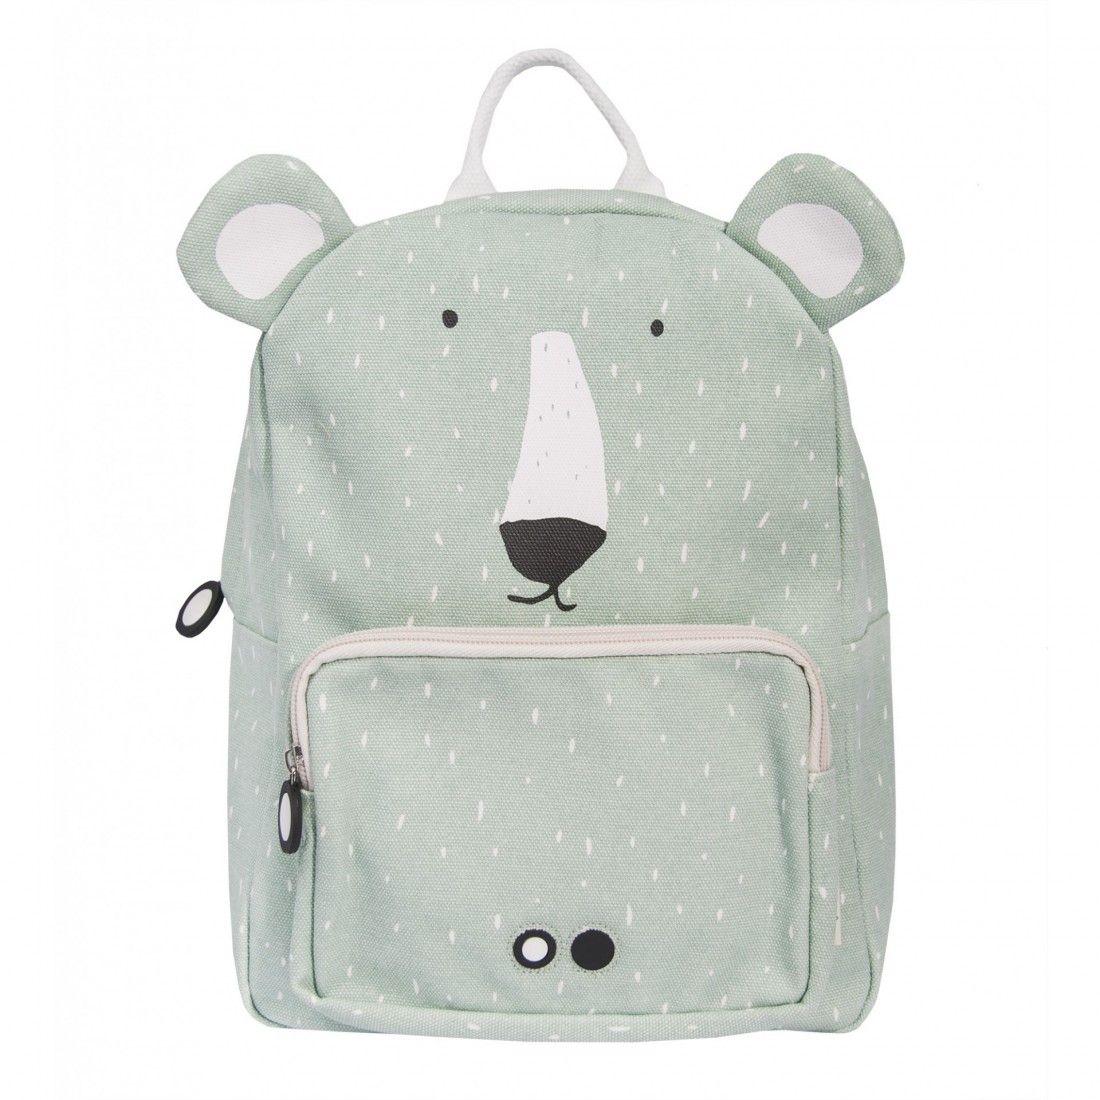 13c0c65131e Παιδική τσάντα - Mr polar Bear | Τσαντες για το Νηπιο // Backpacks ...